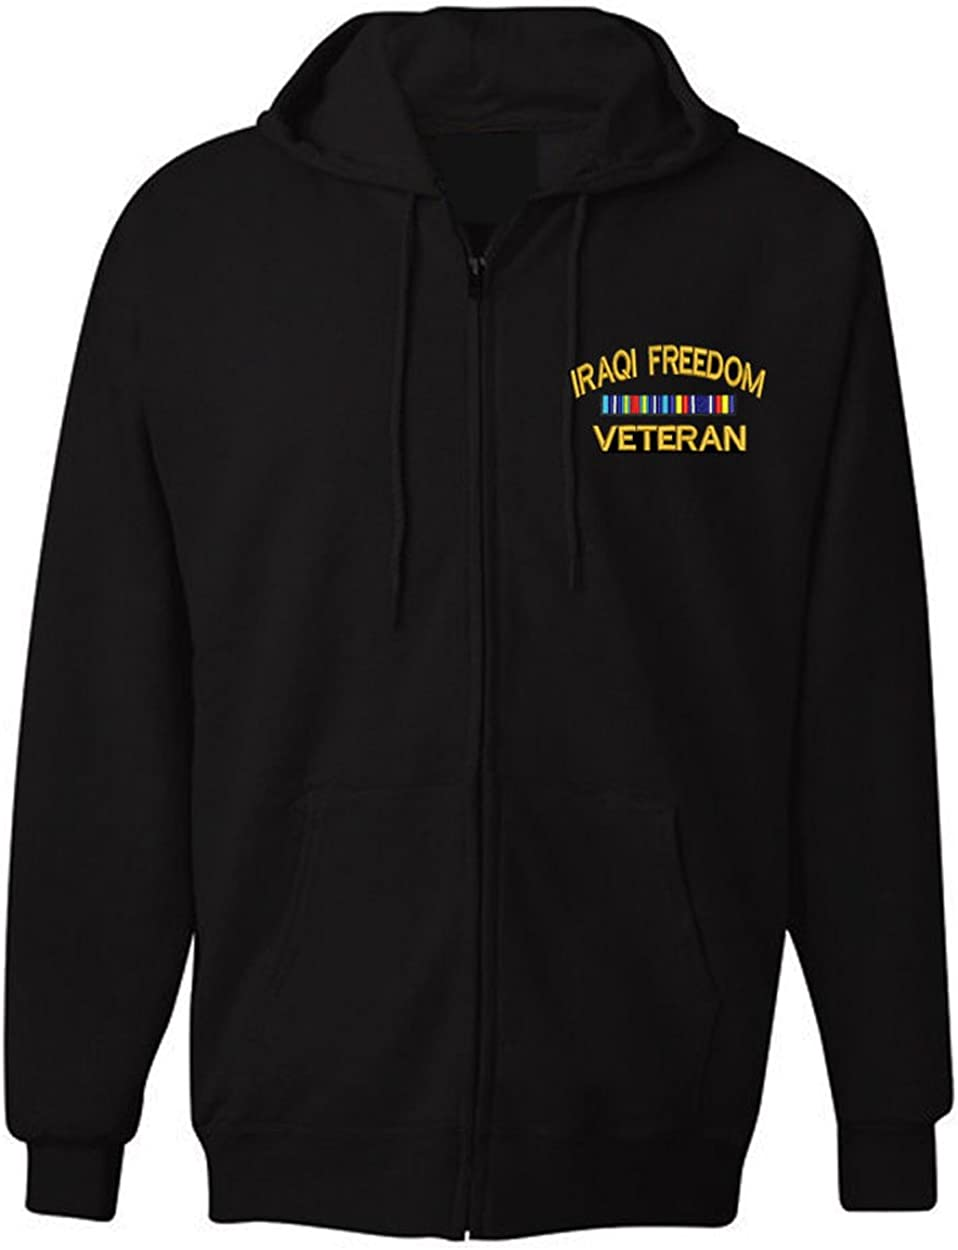 Bargain Koopa Direct sale of manufacturer mens Hoodie